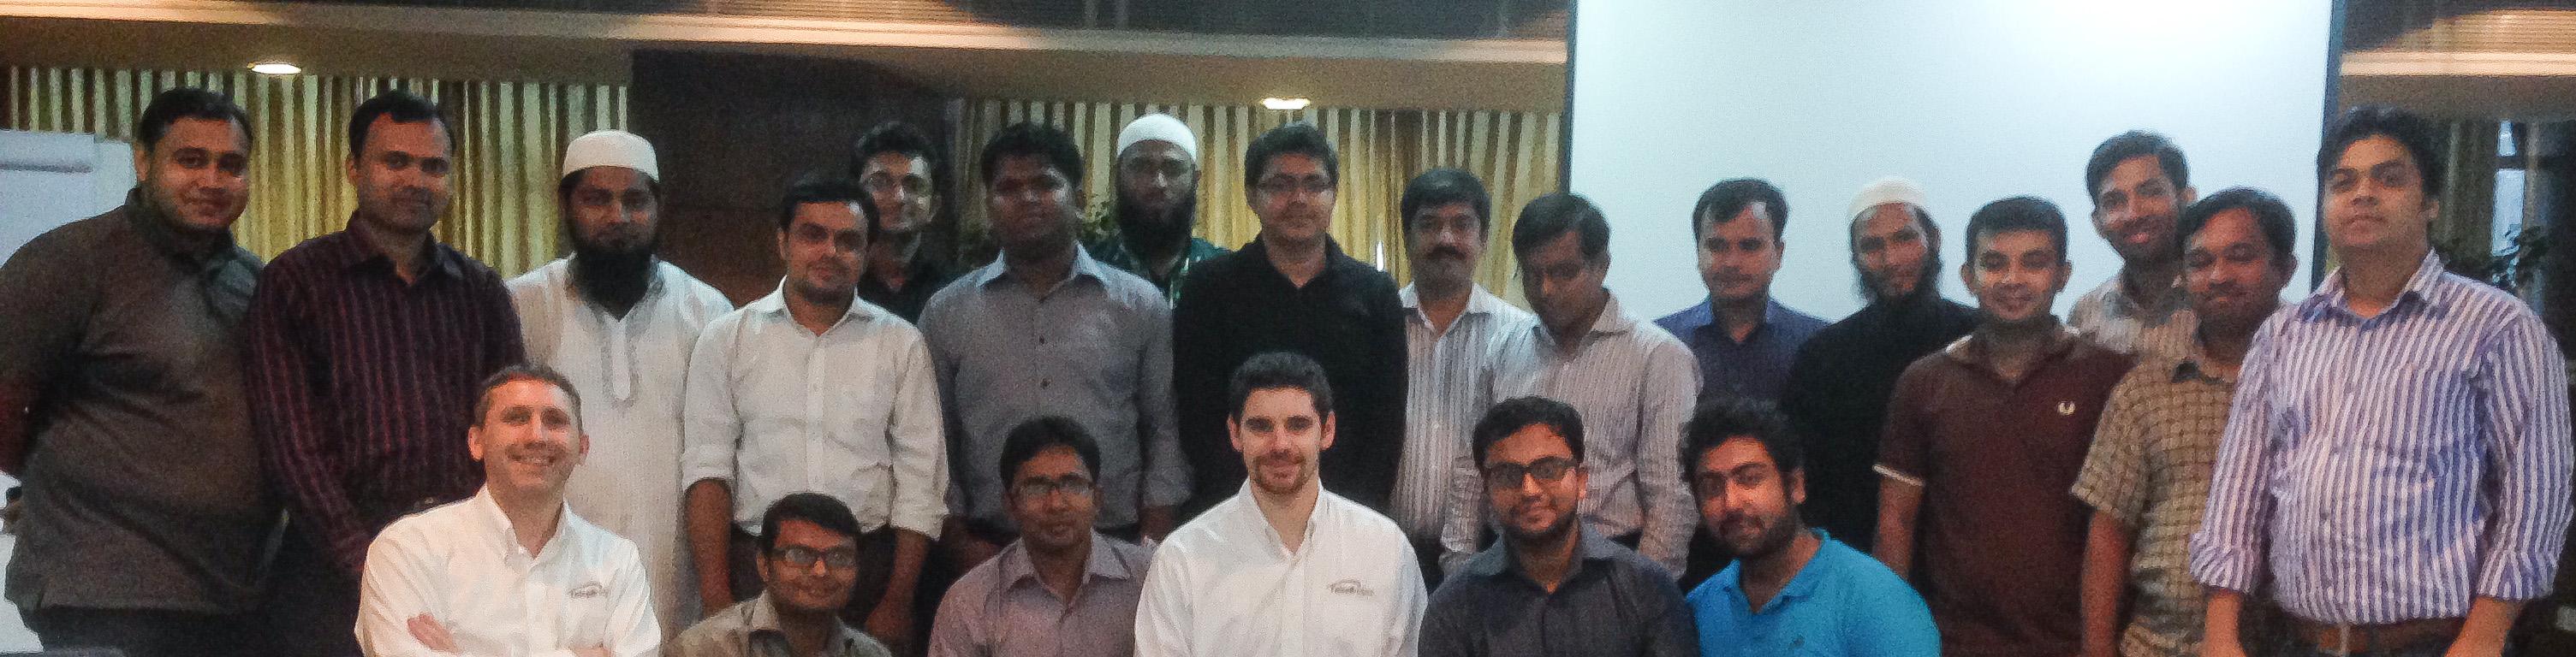 TB Academy training in Bangladesh Group Photo